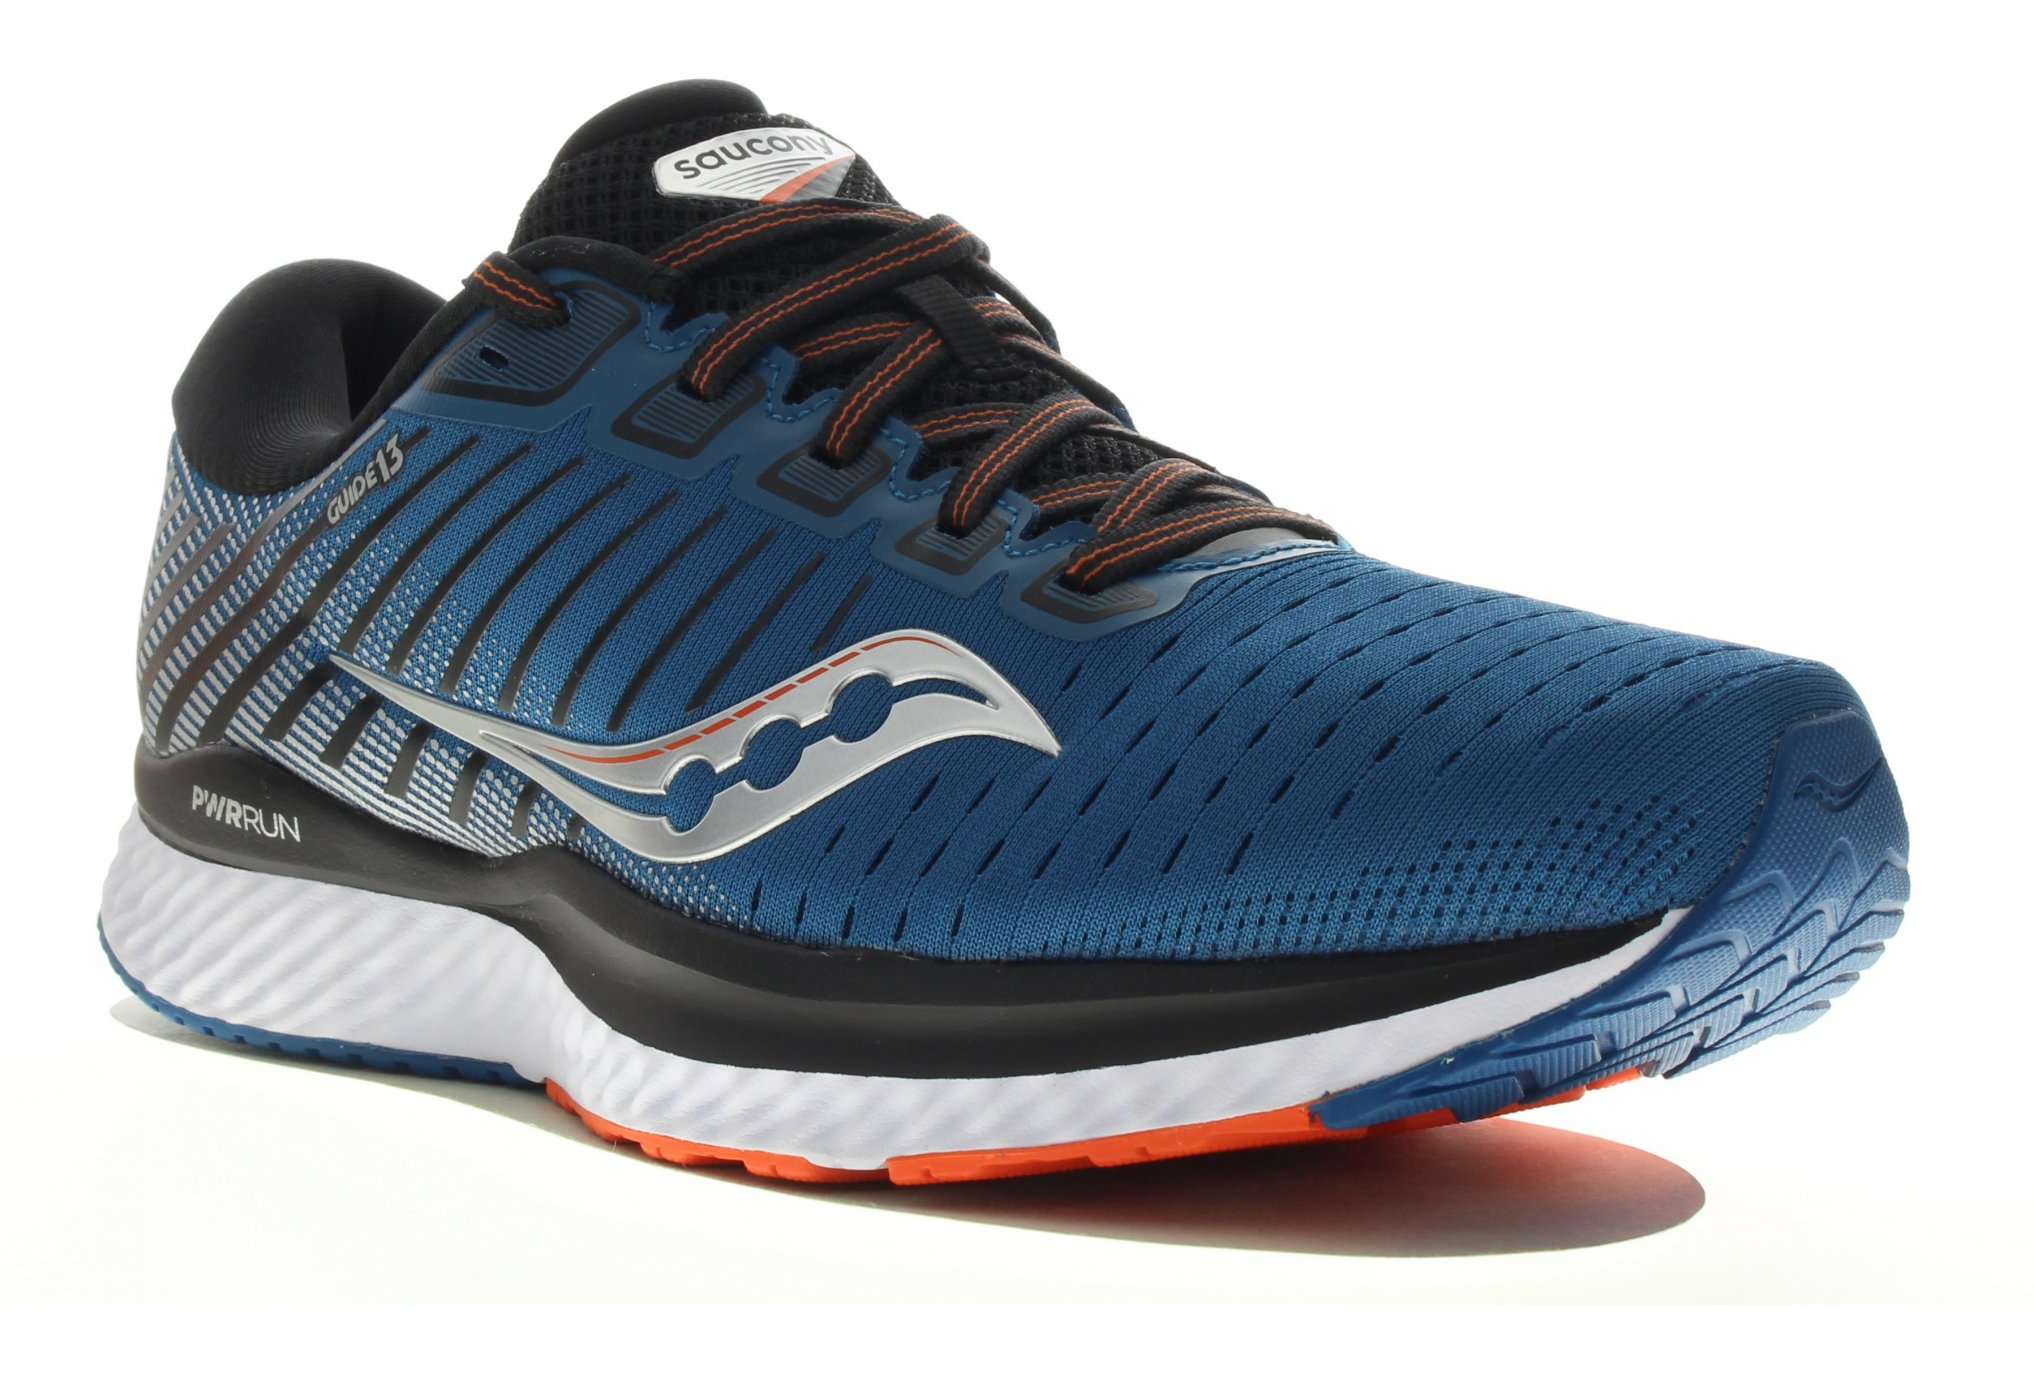 La chaussure de running GUIDE 13 Saucony U Run